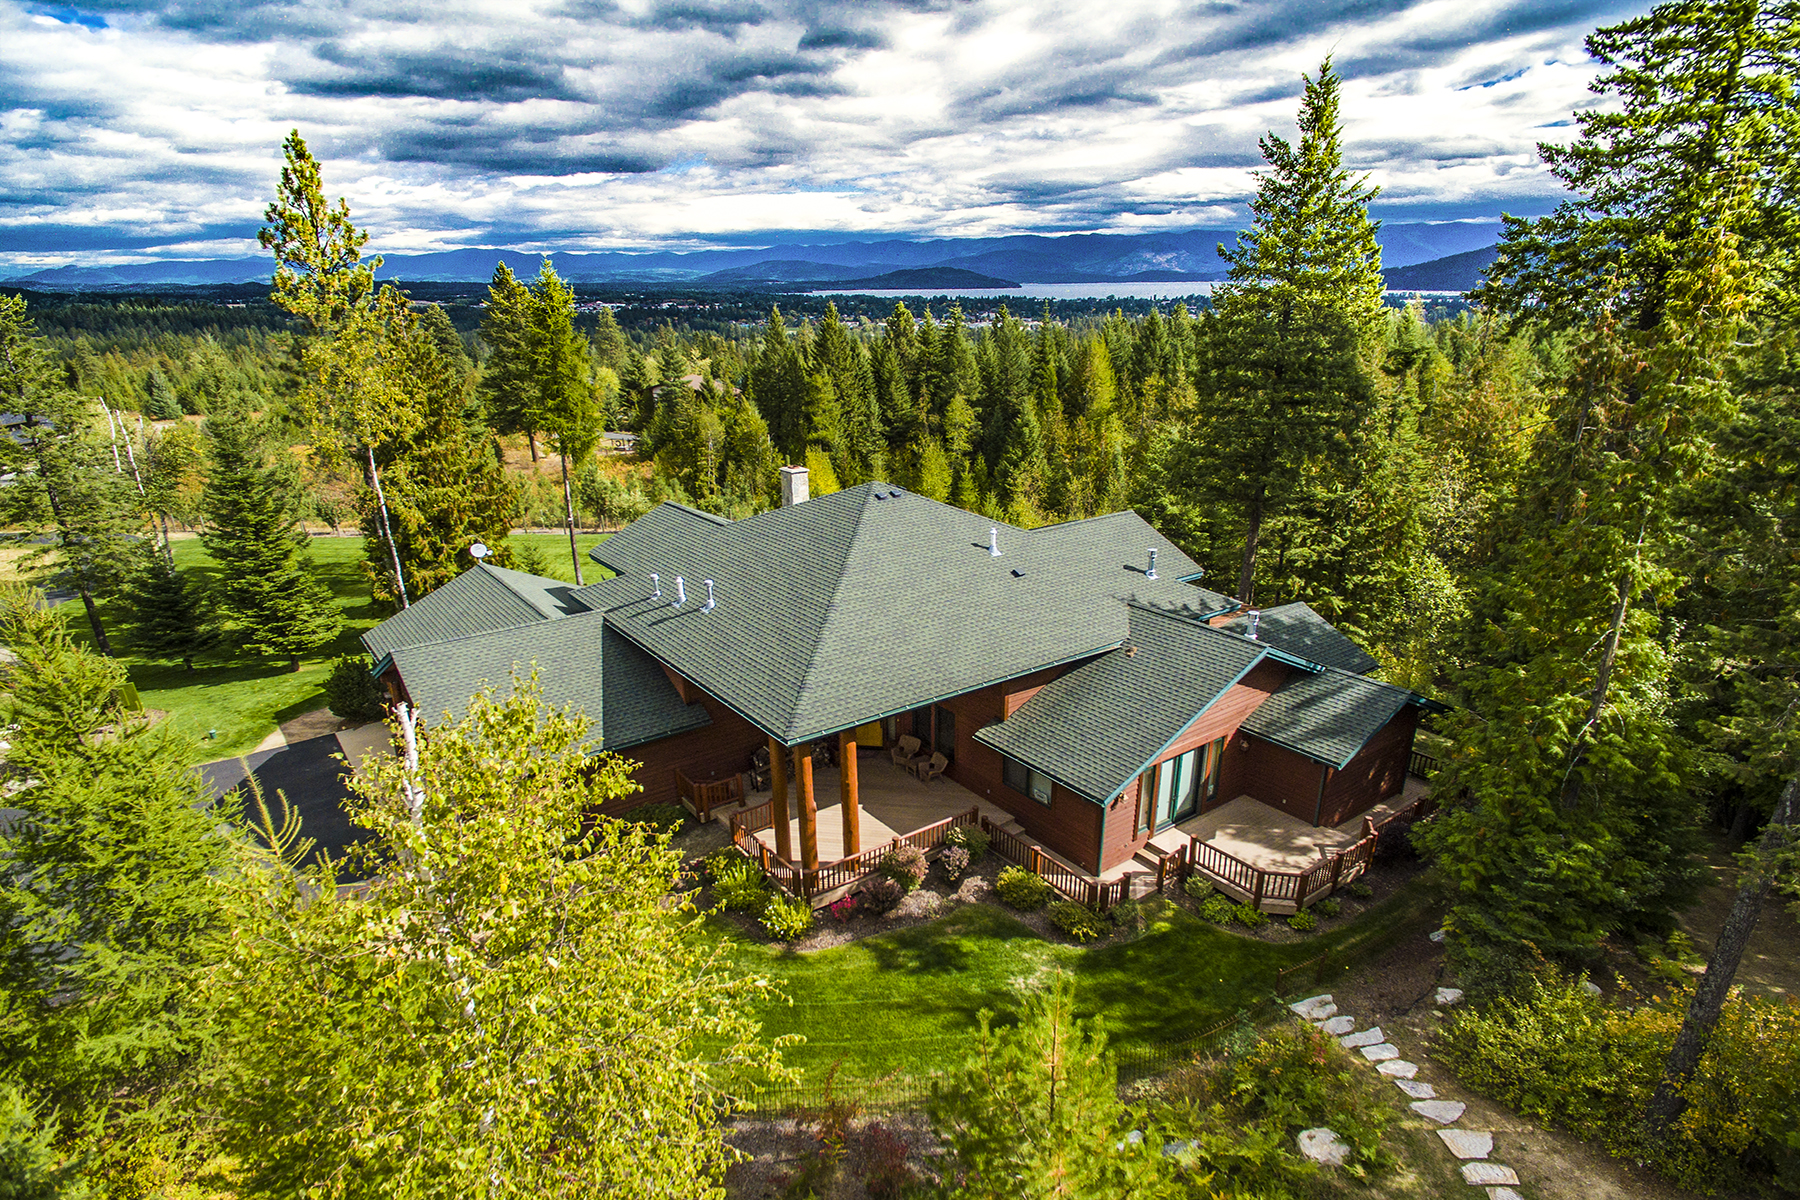 独户住宅 为 销售 在 Stunning Contemporary Mountain View Home 444 Ravenwood Dr 桑德波因特, 爱达荷州, 83864 美国